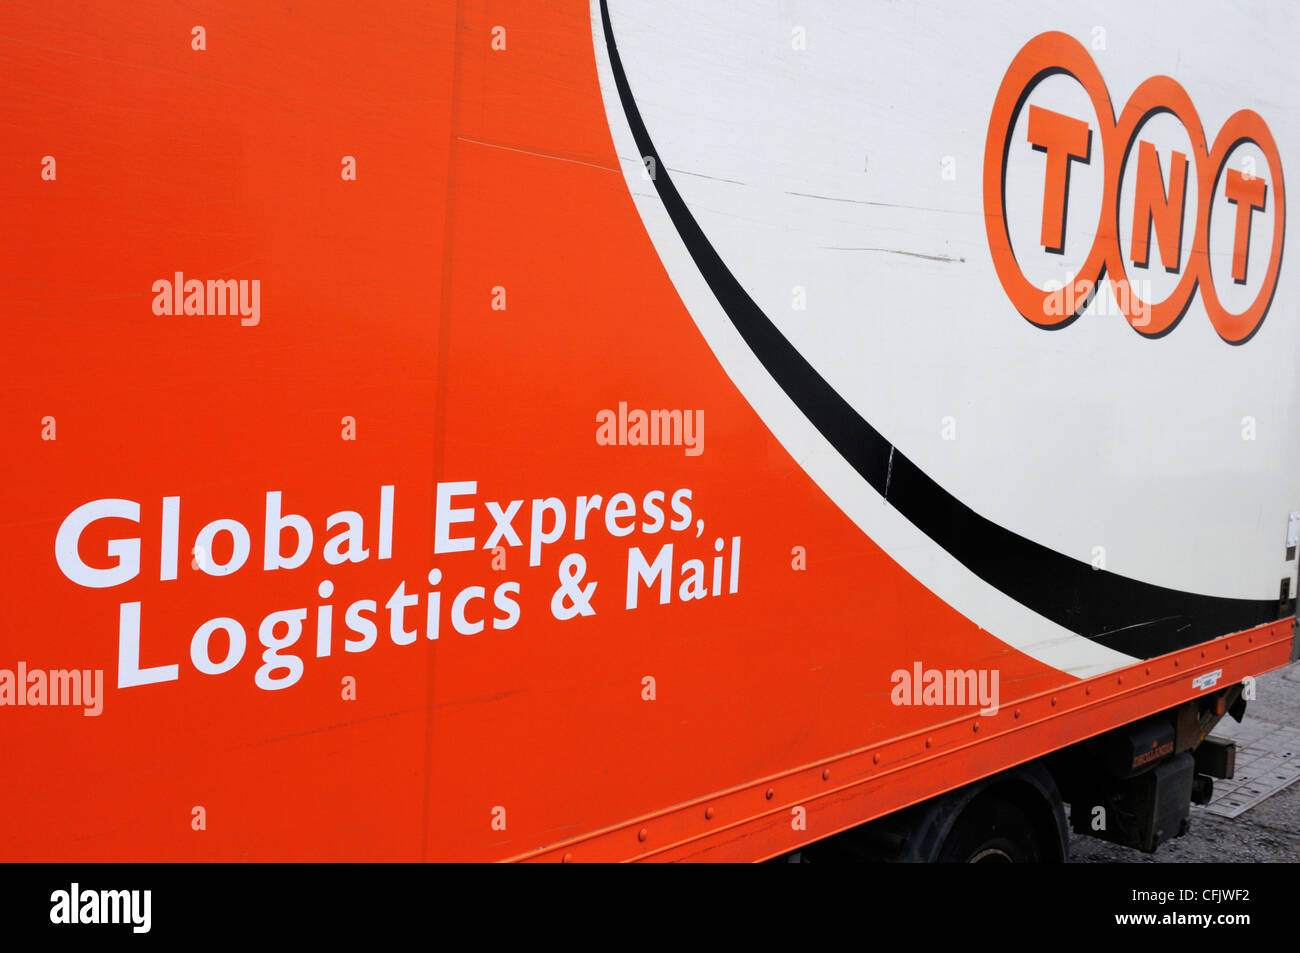 TNT Courier van detail, Cambridge, England, UK - Stock Image